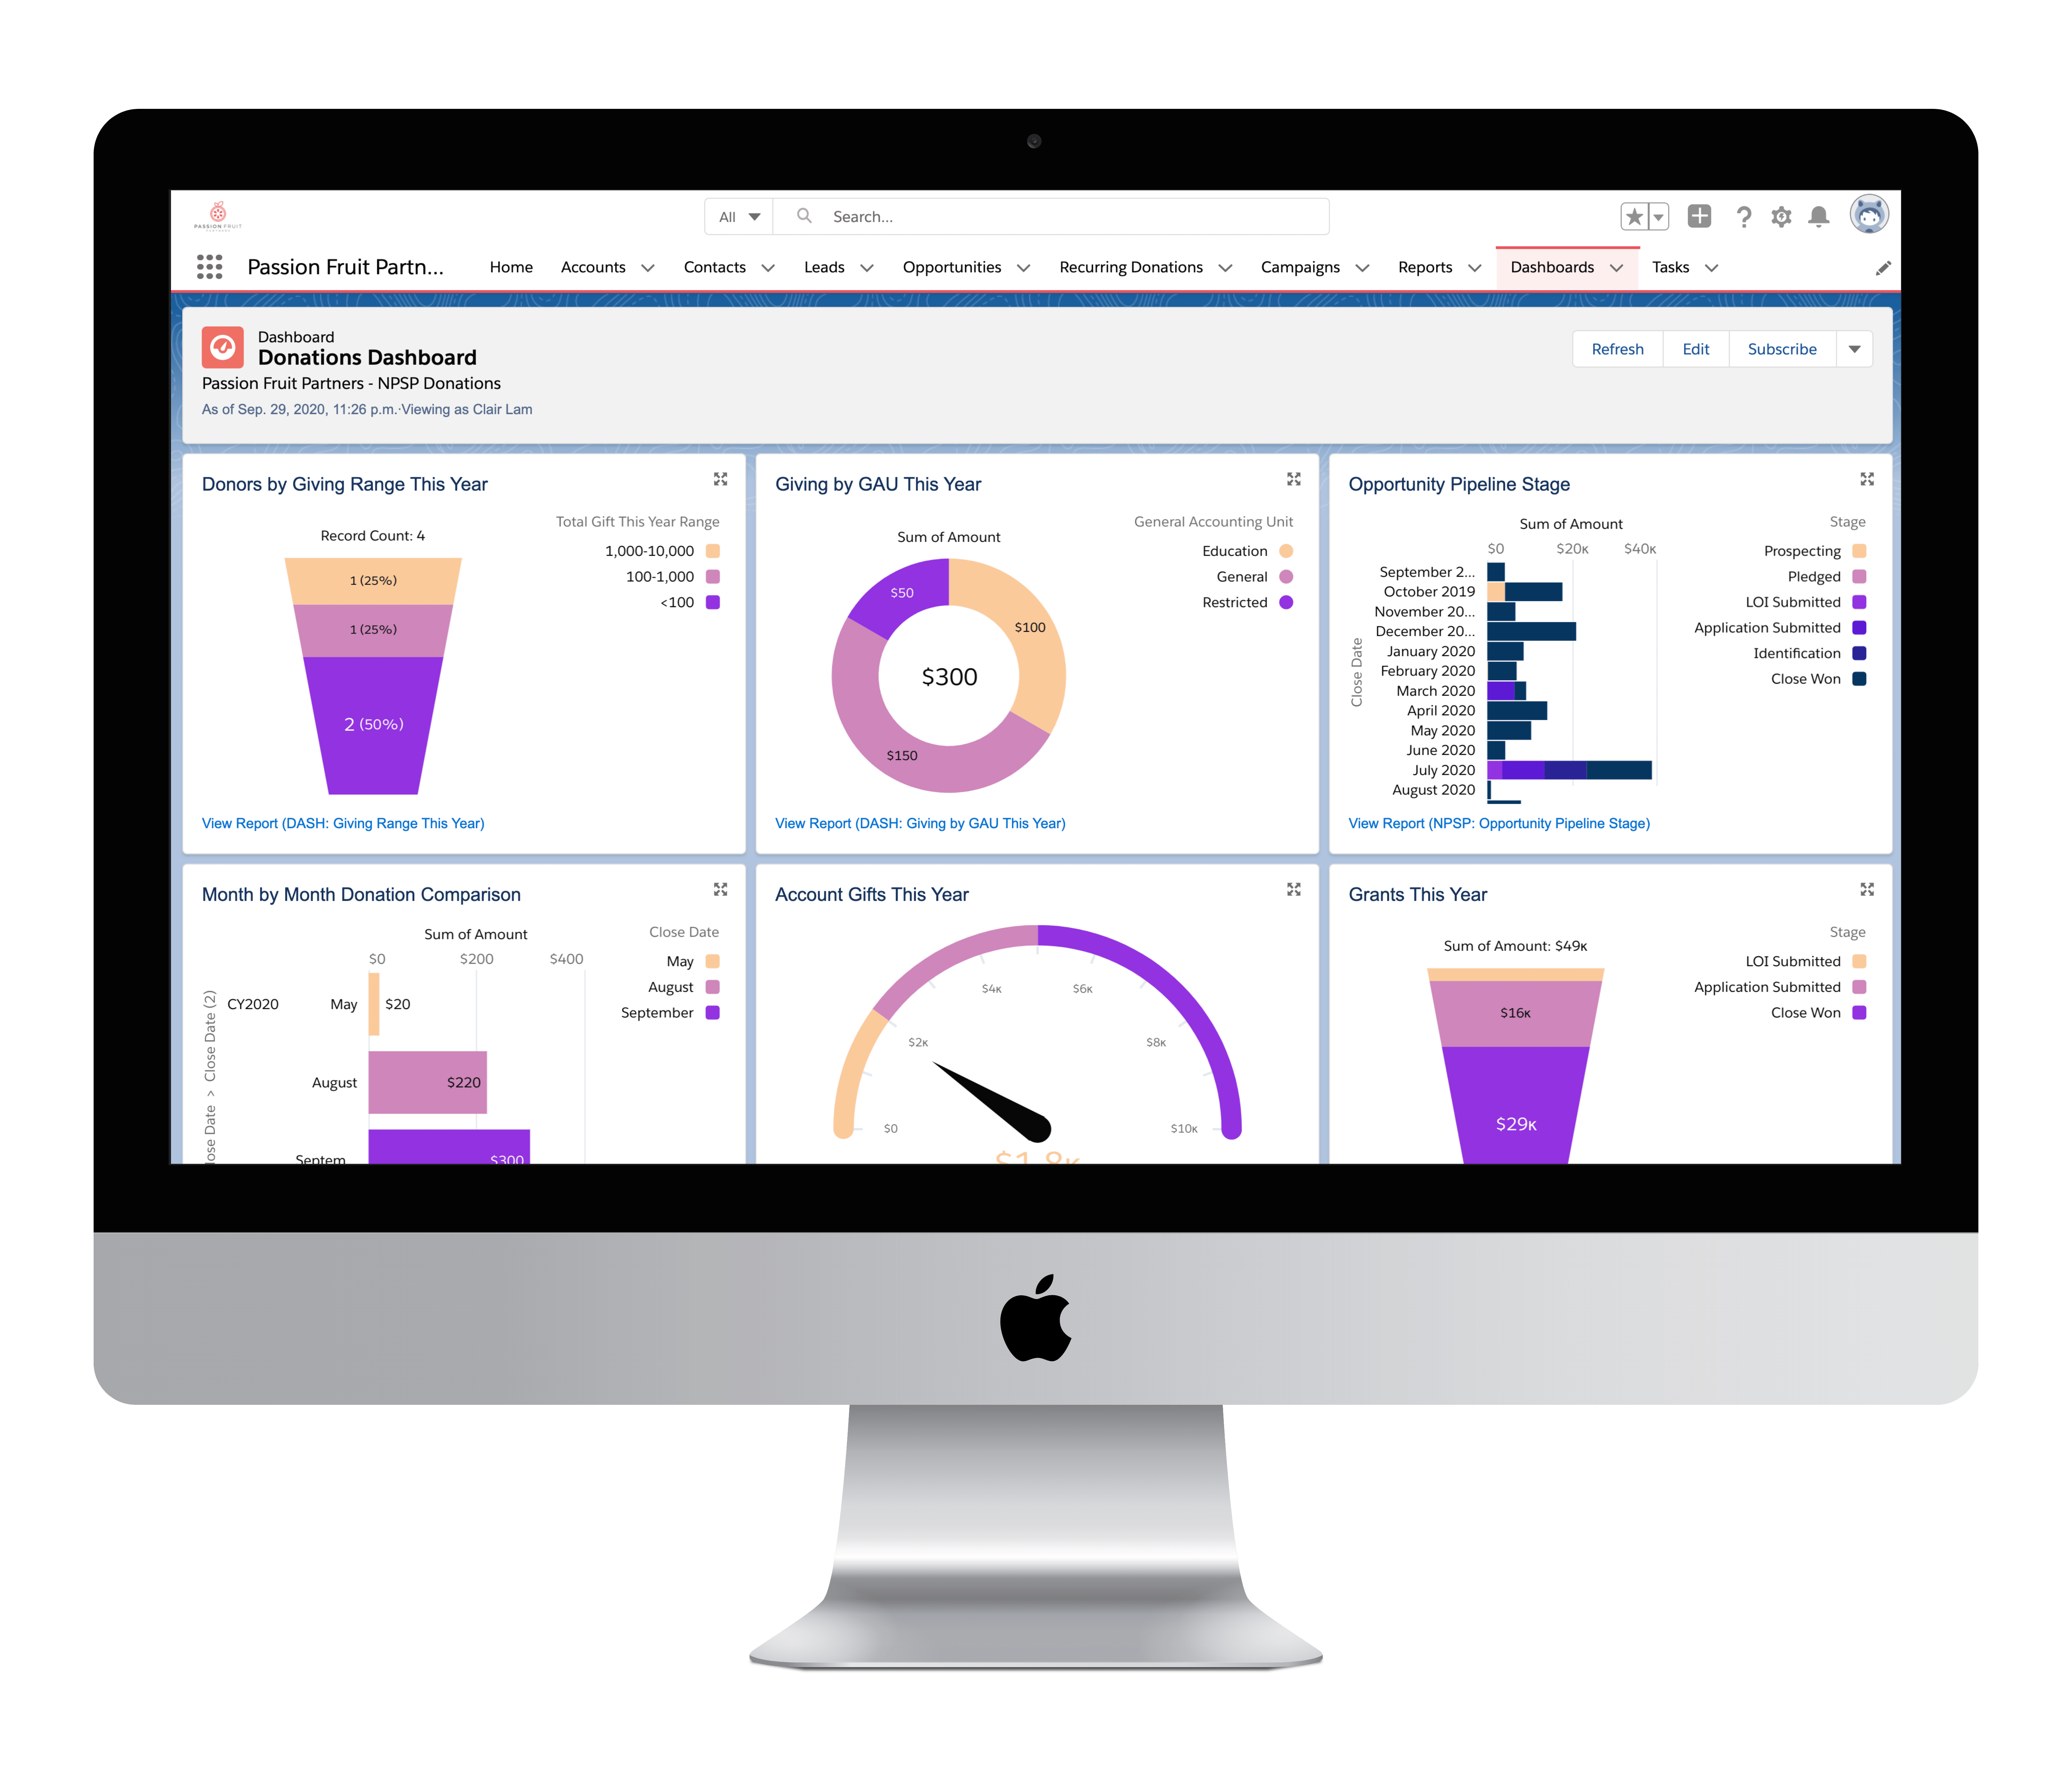 Passion Fruit Salesforce Dashboard